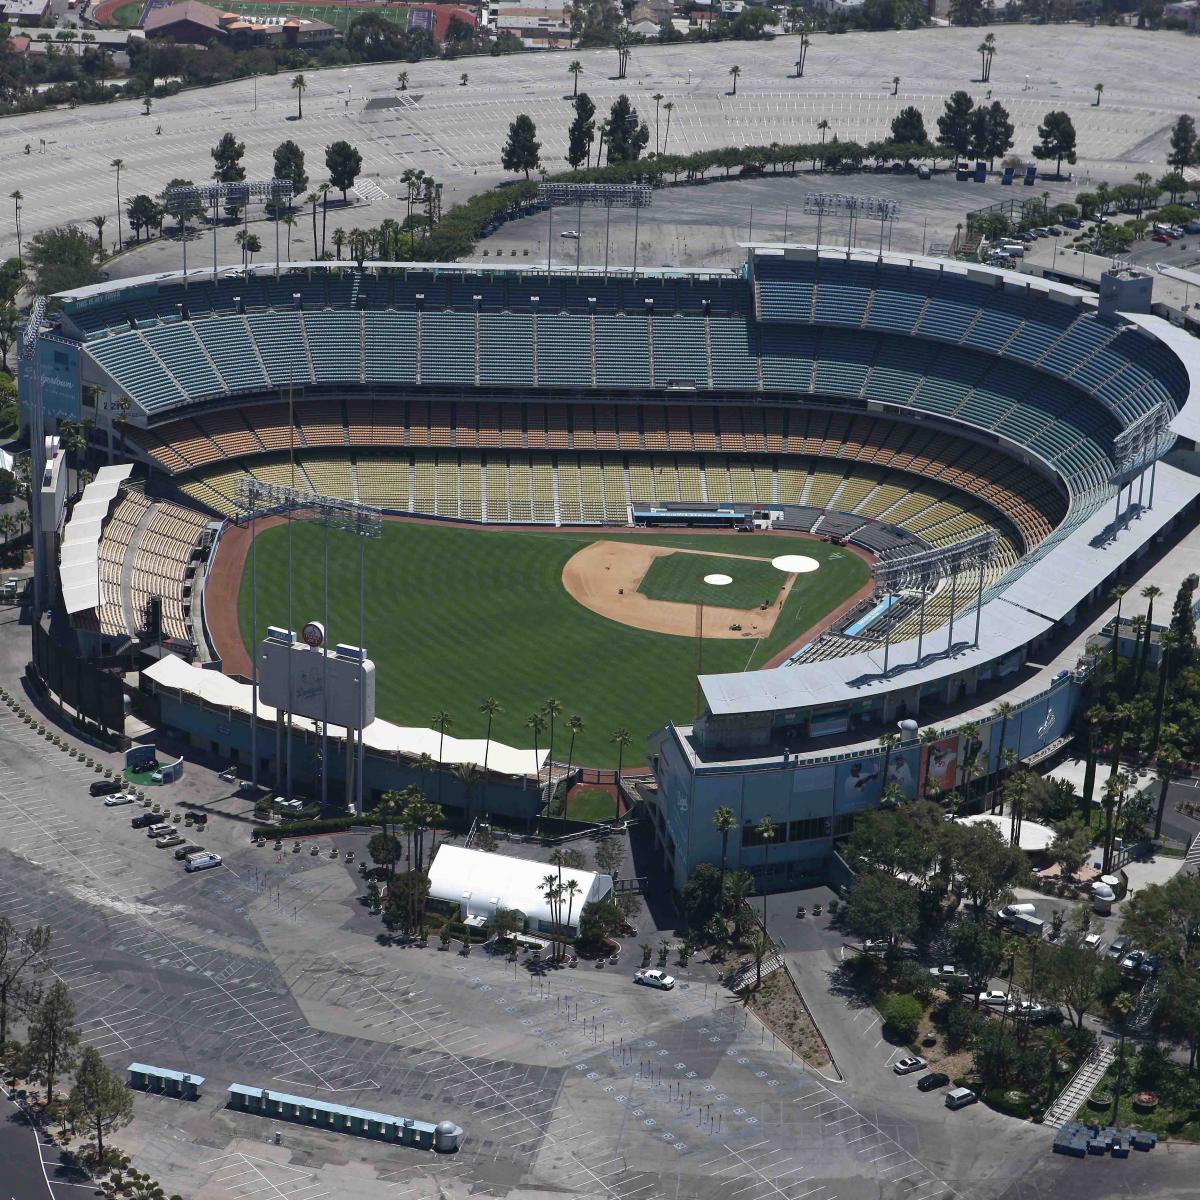 los angeles dodgers   stadium design    chavez ravine bleacher report